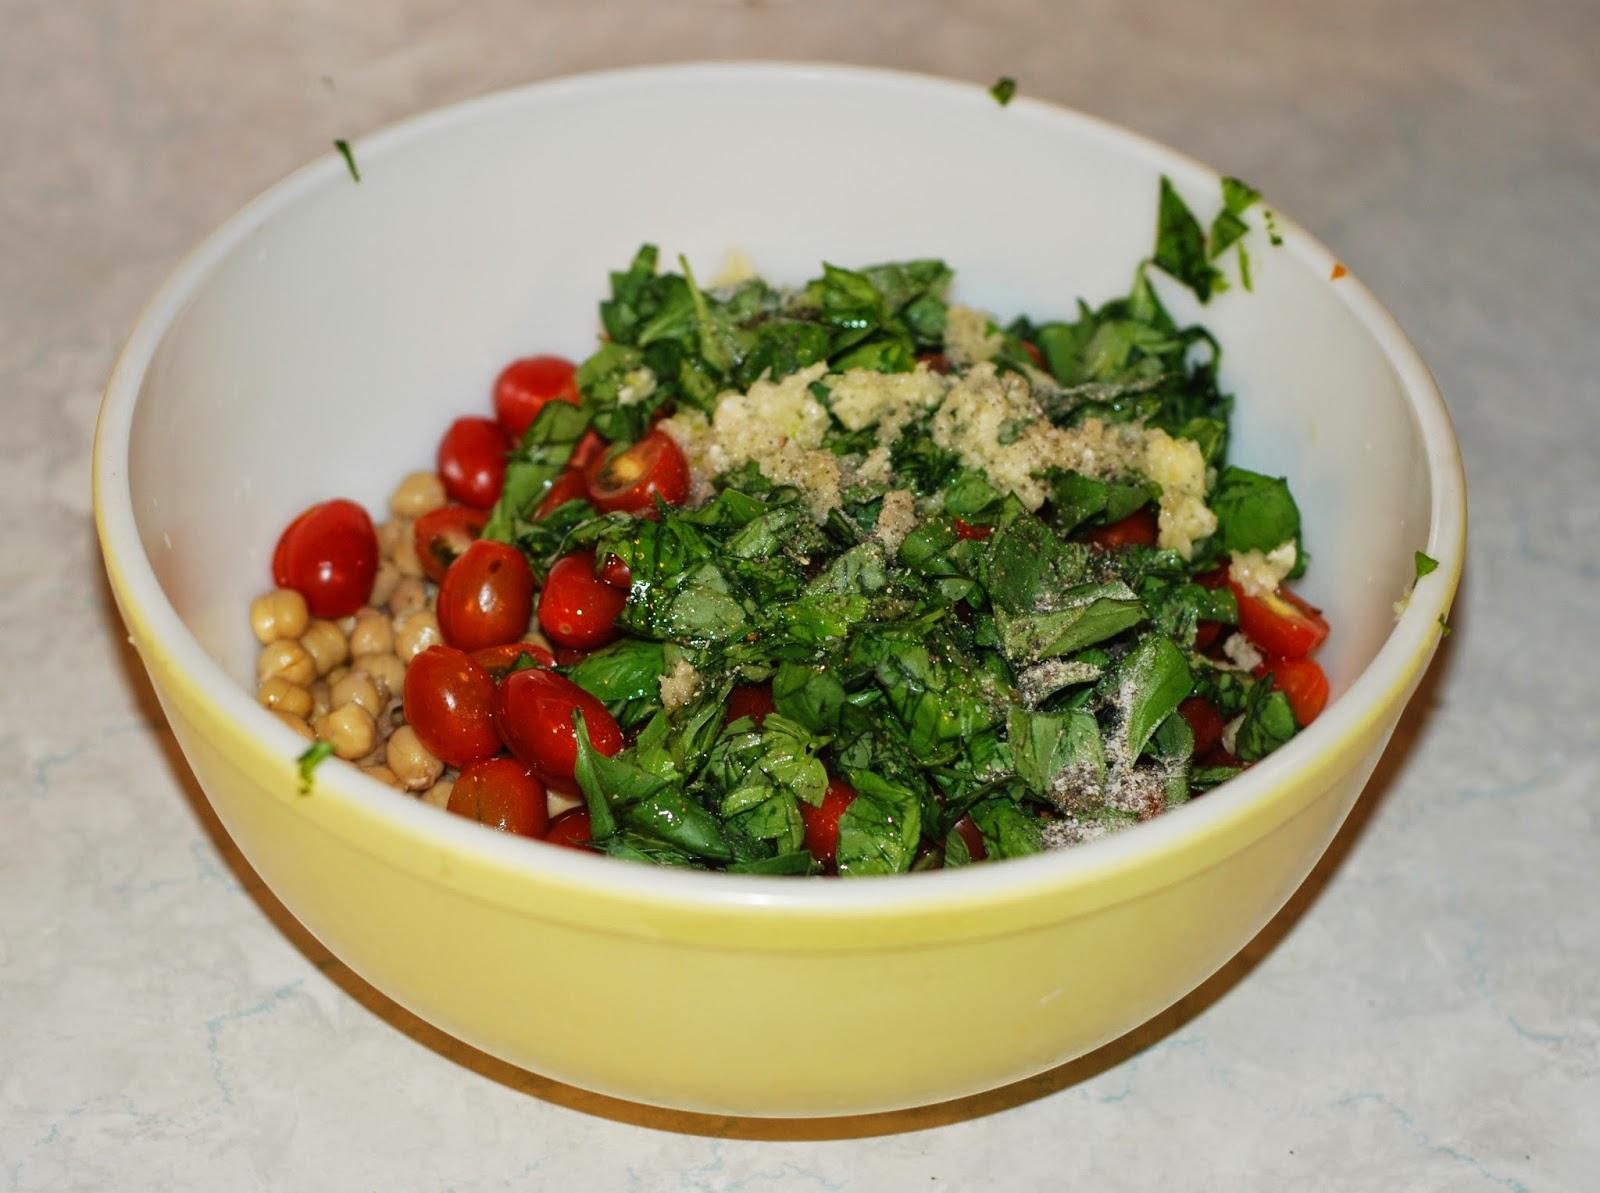 tomato, chickpea, basil salad